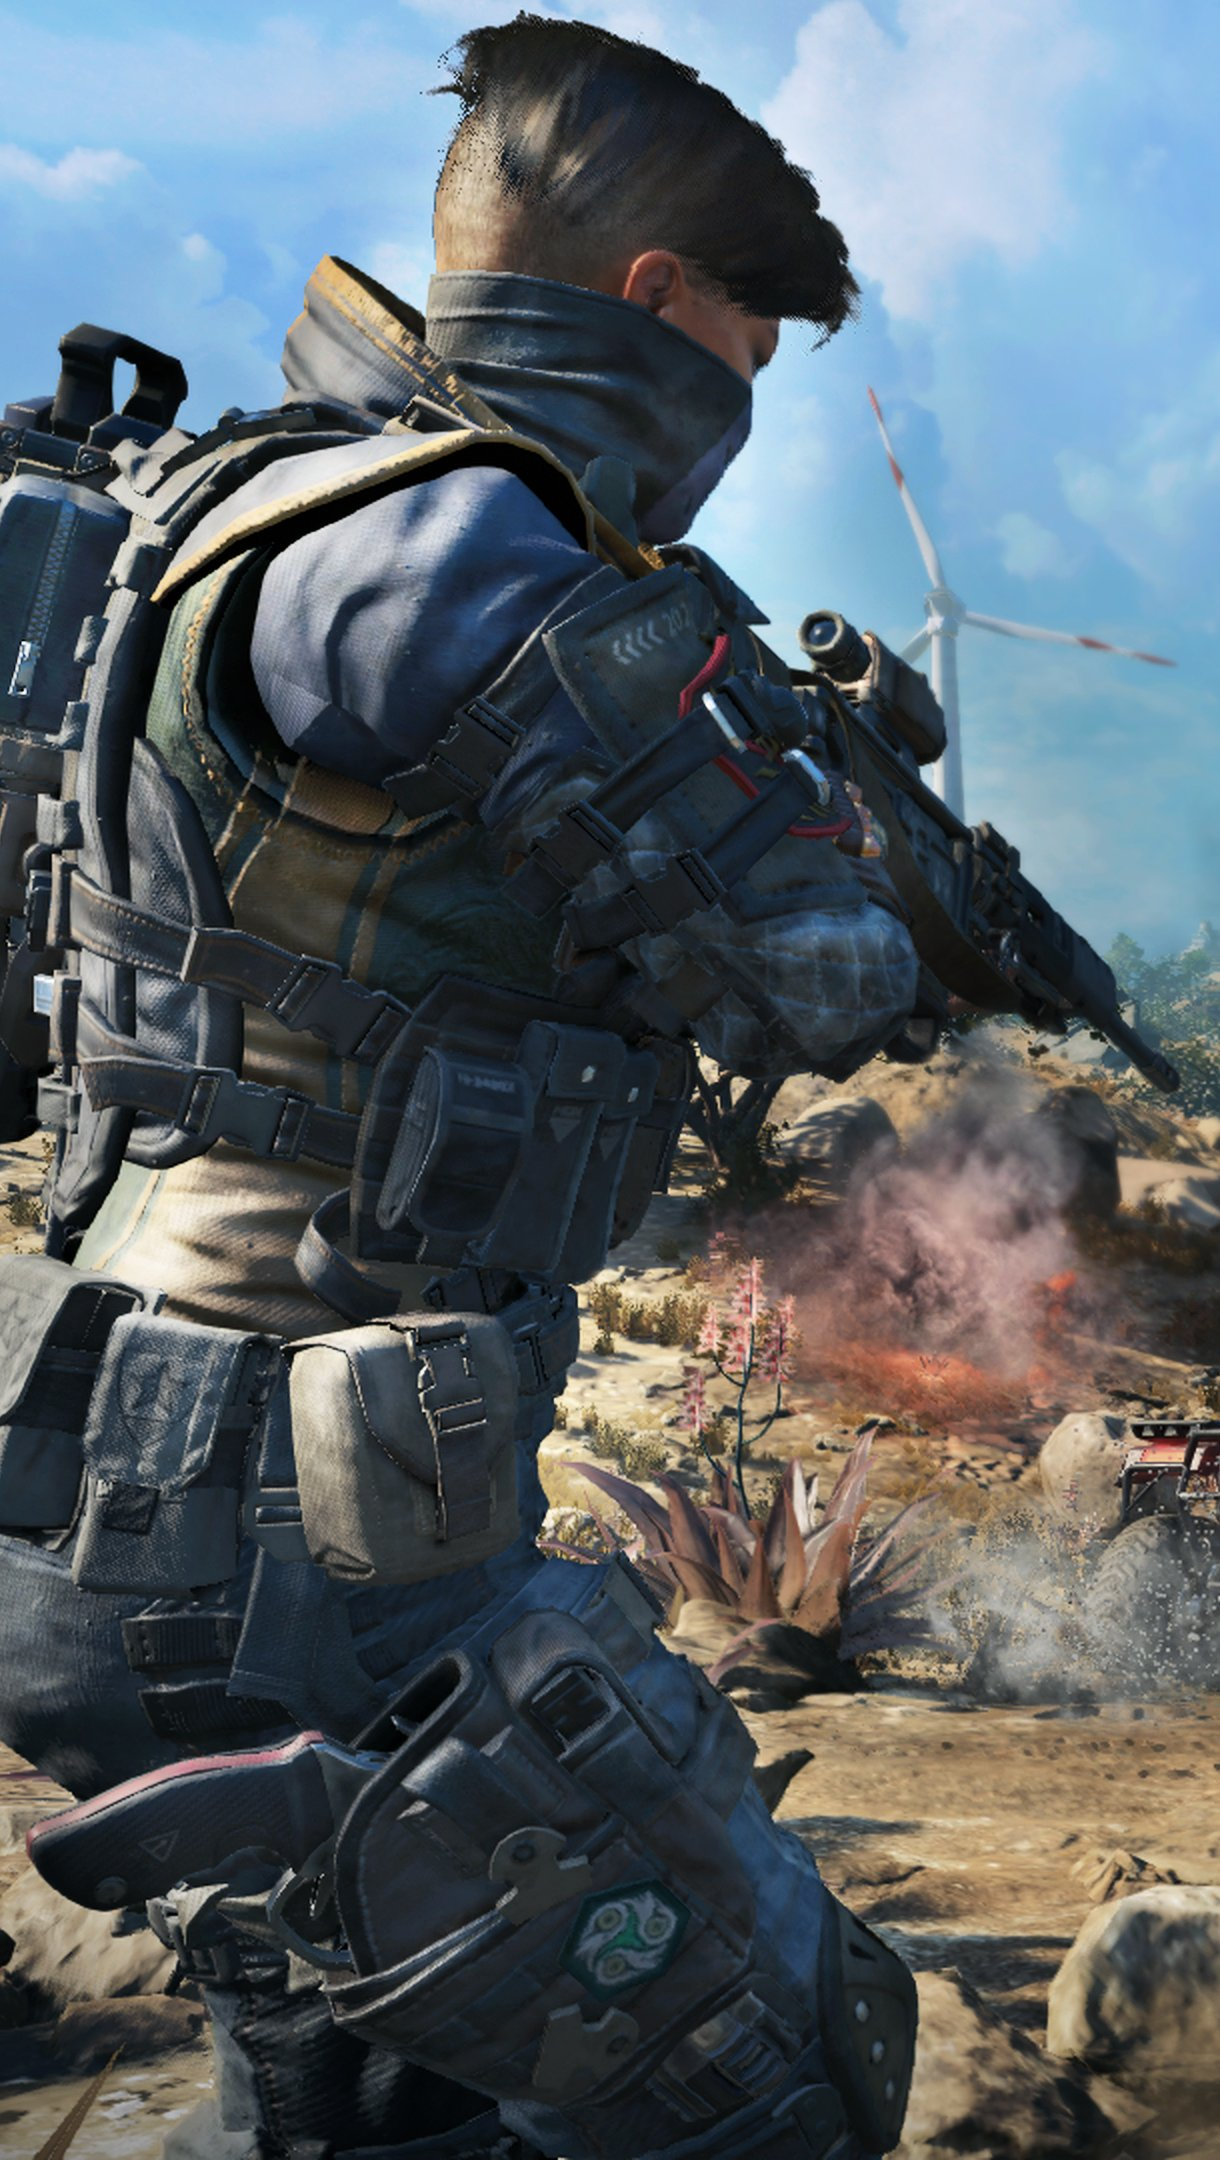 Wallpaper Call of Duty Black Ops 4 Blackout Vertical